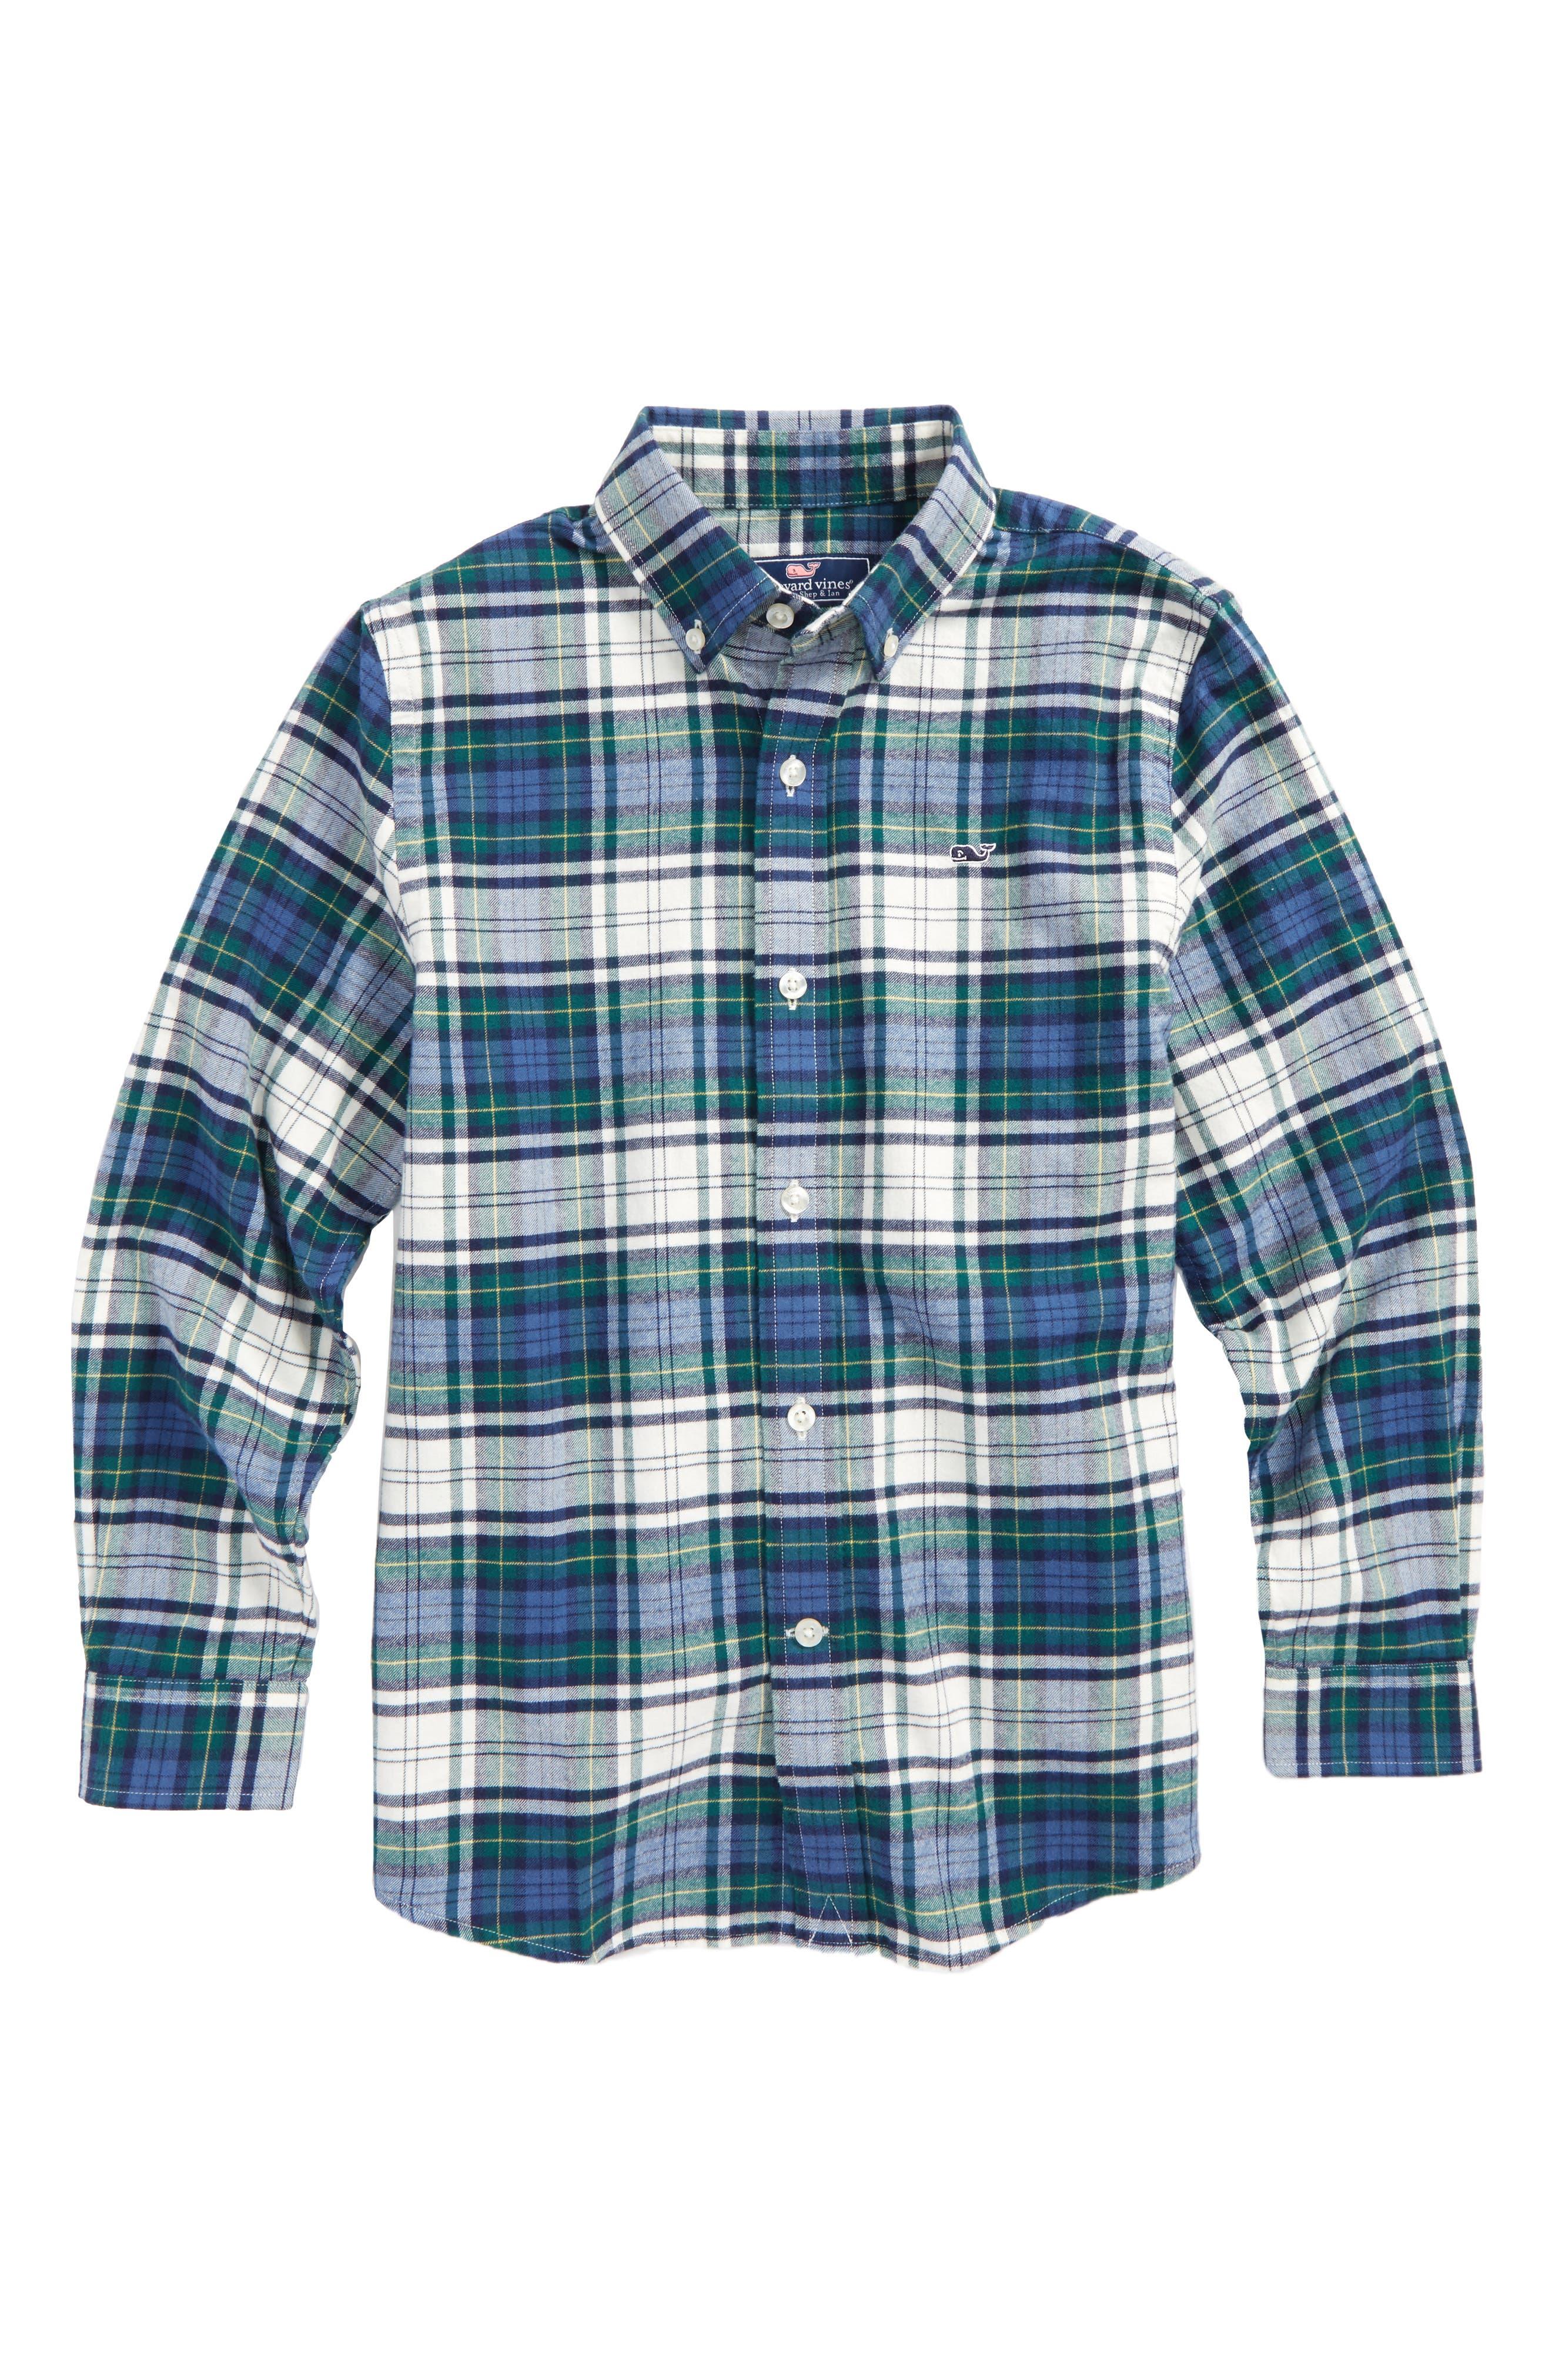 Alternate Image 1 Selected - vineyard vines Hayward Point Plaid Flannel Shirt (Toddler Boys, Little Boys & Big Boys)